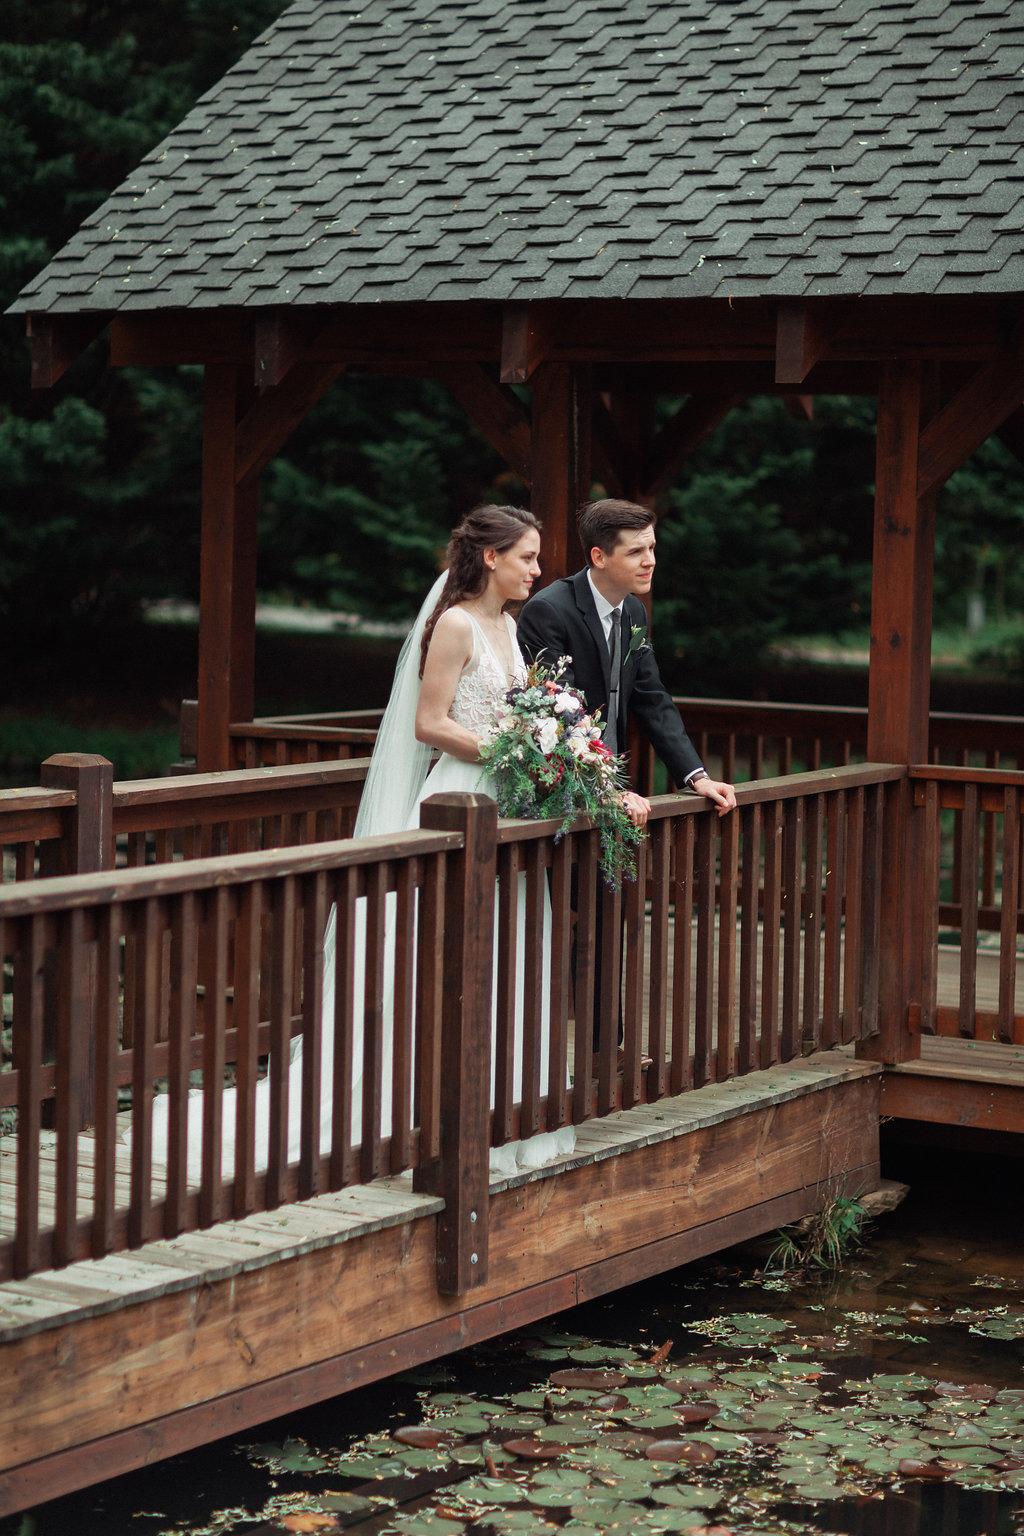 Honeysuckle-Hill-Weddings-Mallory-Patrick-63.jpg